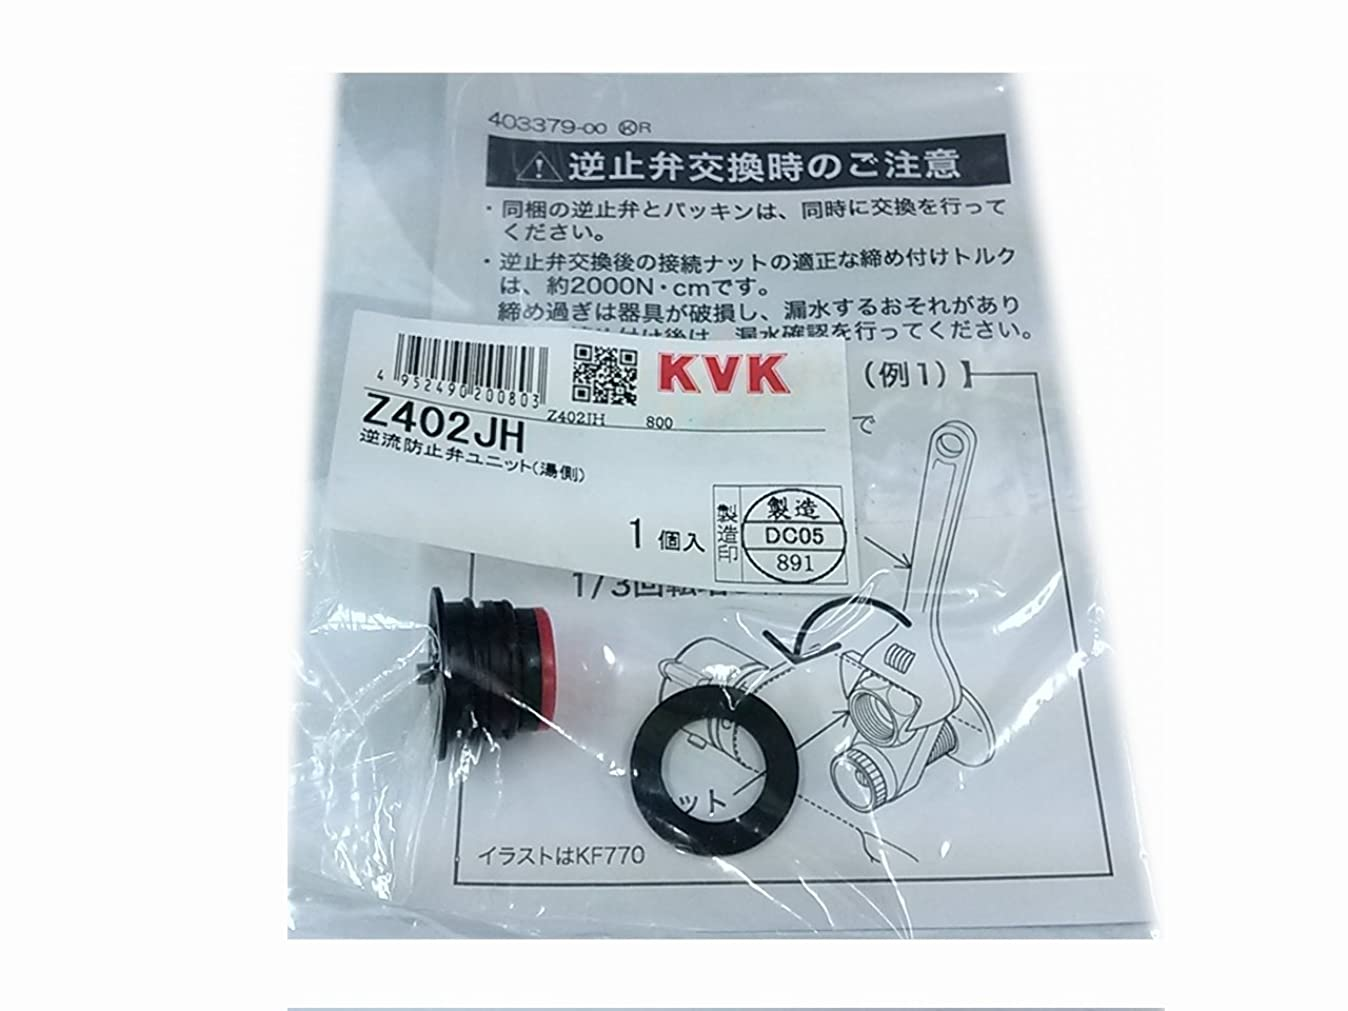 辞任追放石鹸KVK 逆流防止弁ユニット(湯側) Z402JH